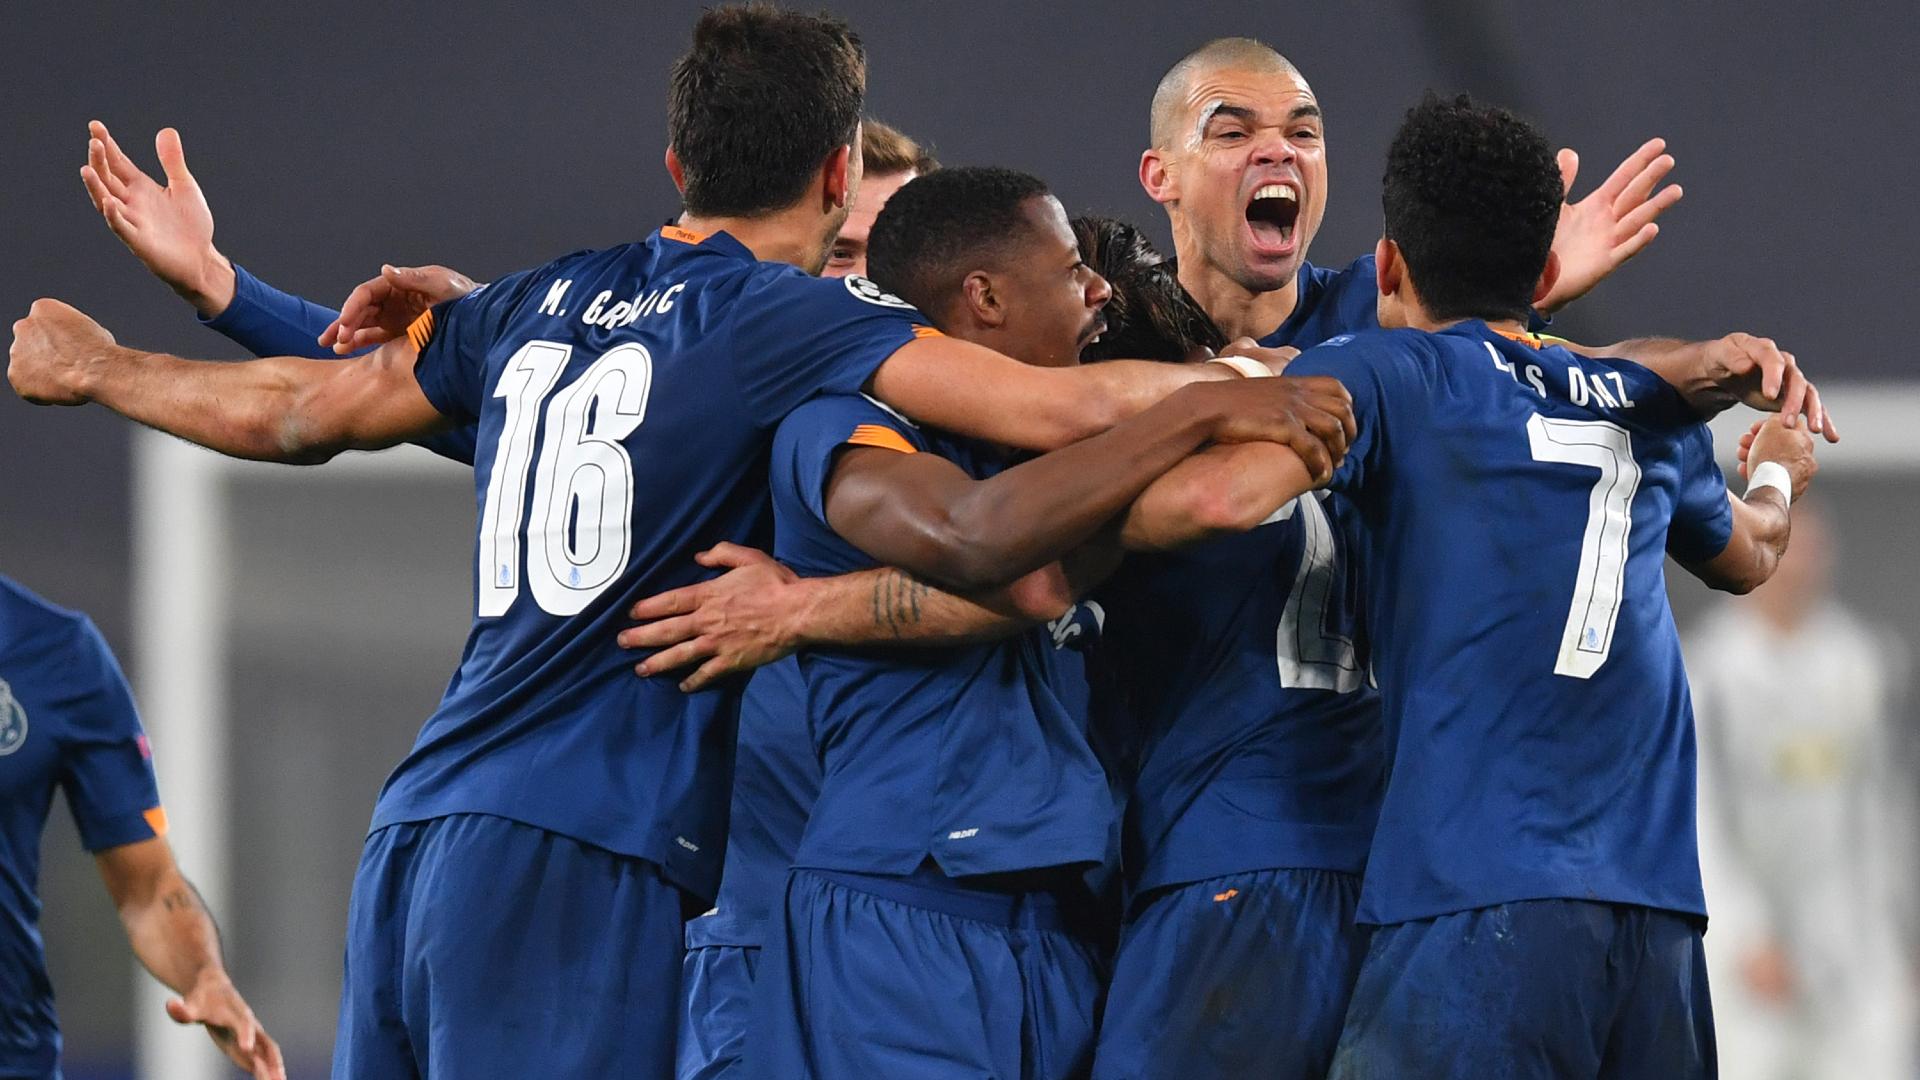 Aouacheria sees first career red as Sanusi's Porto subdue Farense